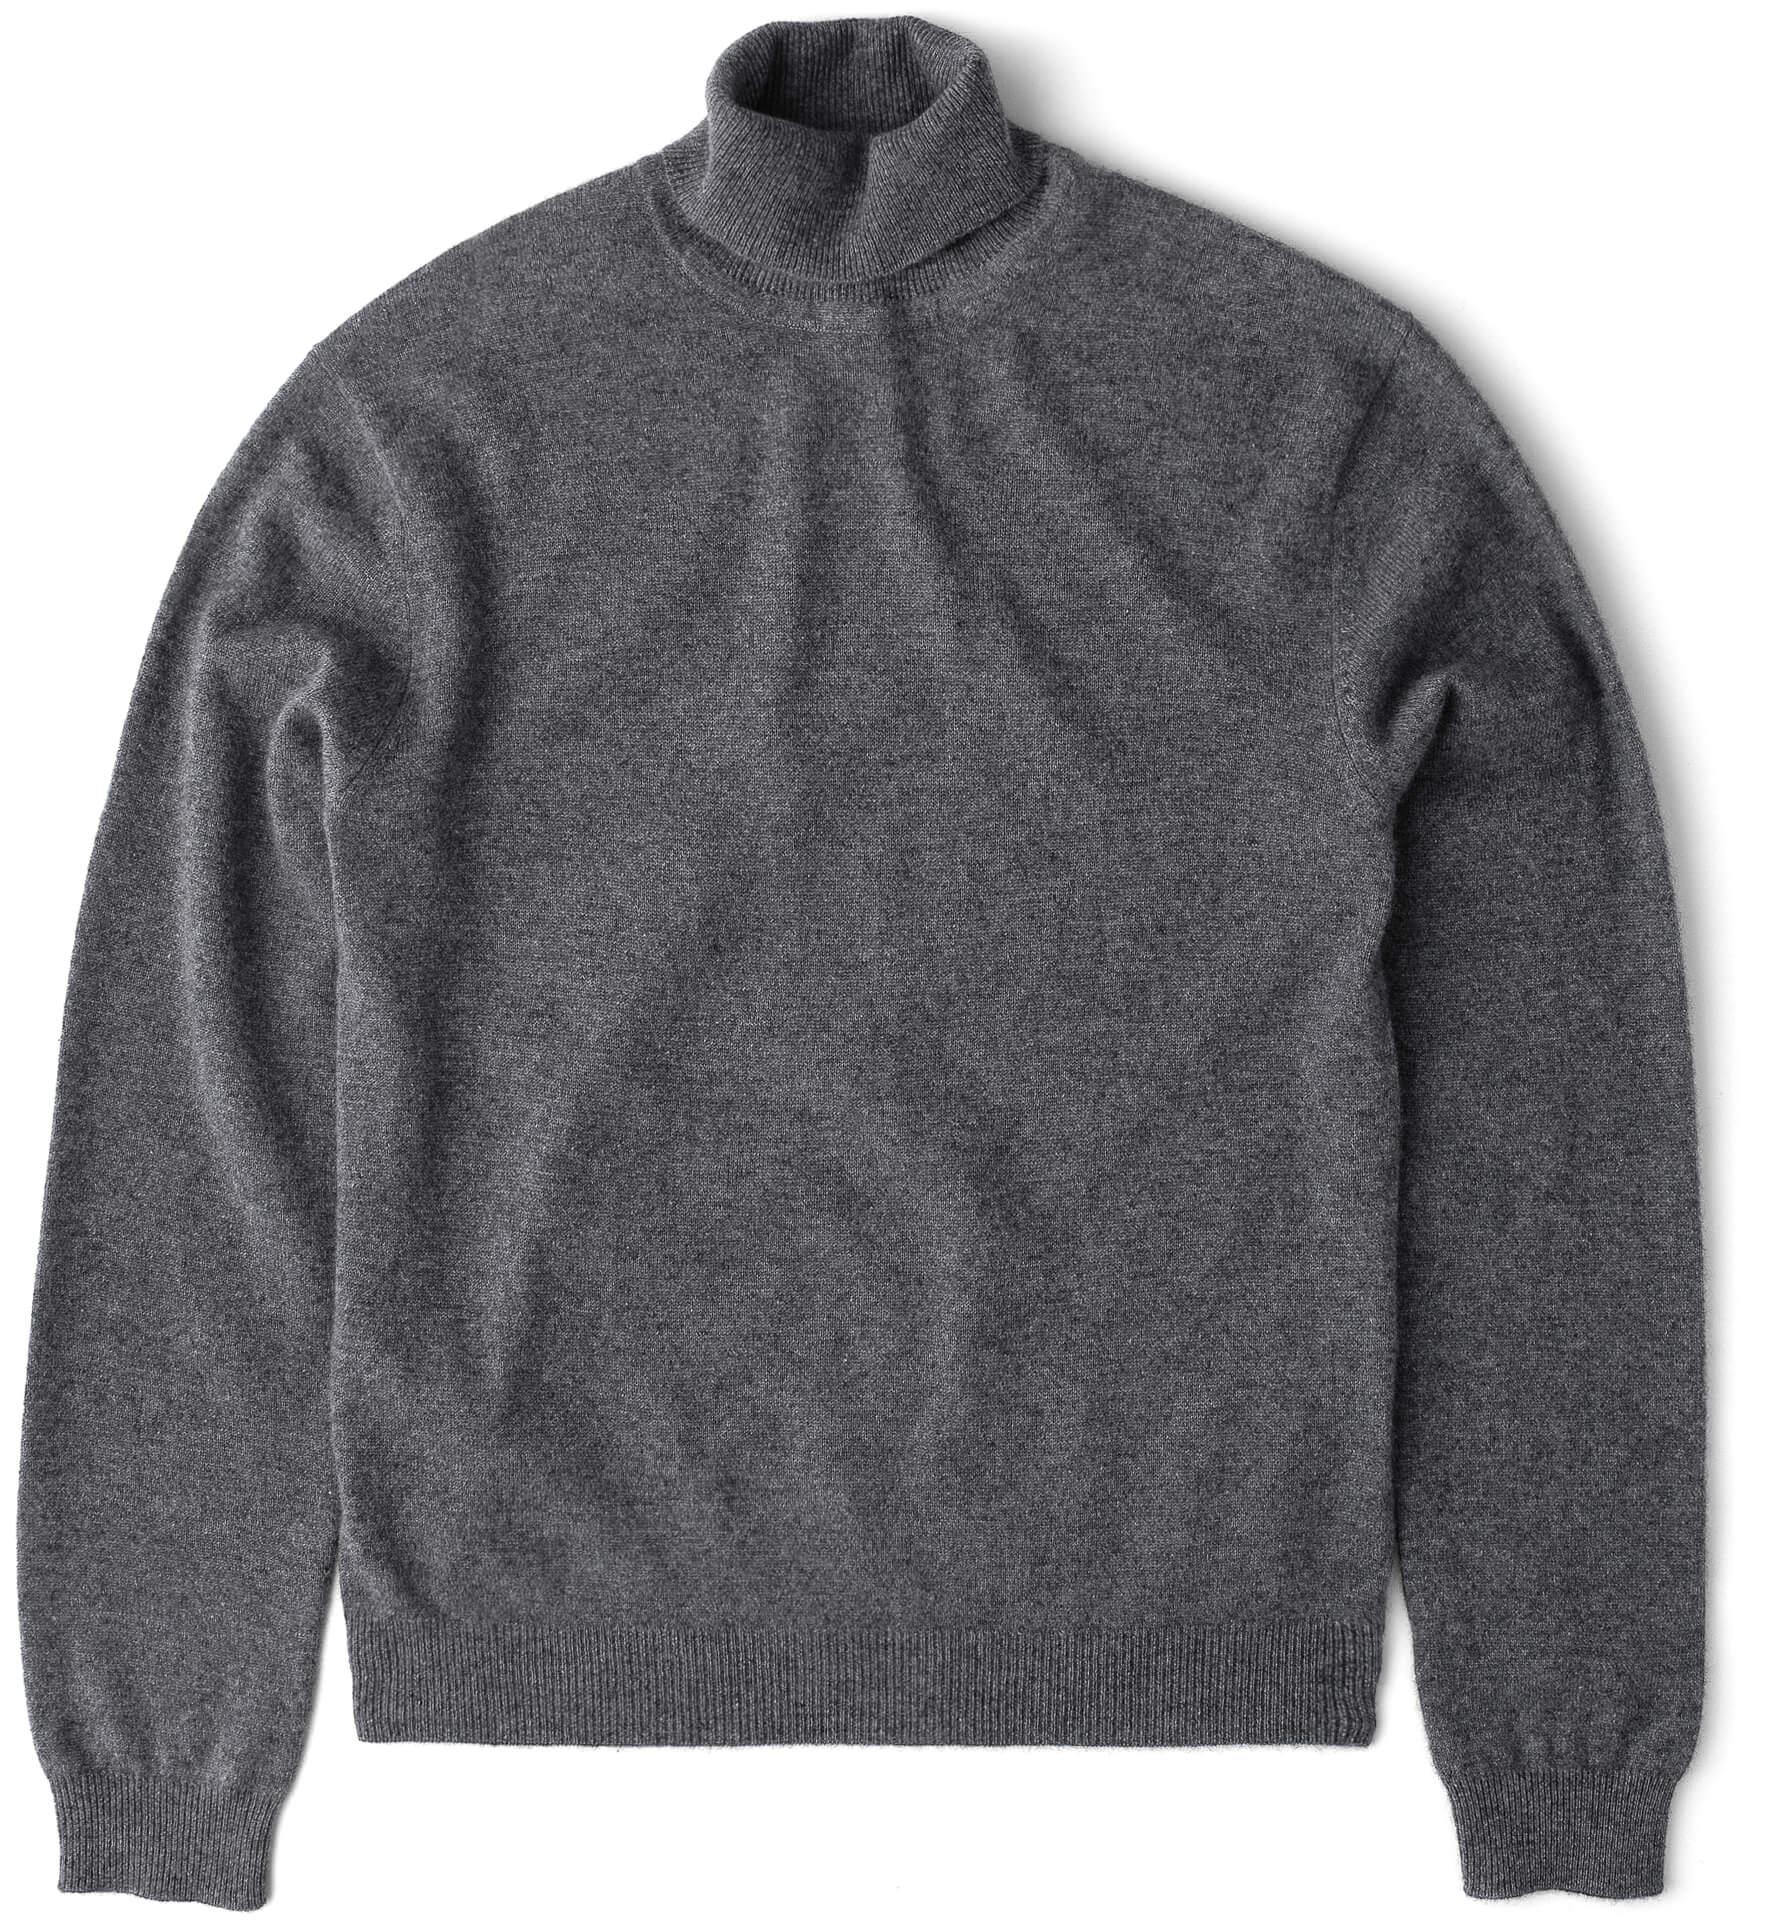 Zoom Image of Grey Cashmere Turtleneck Sweater